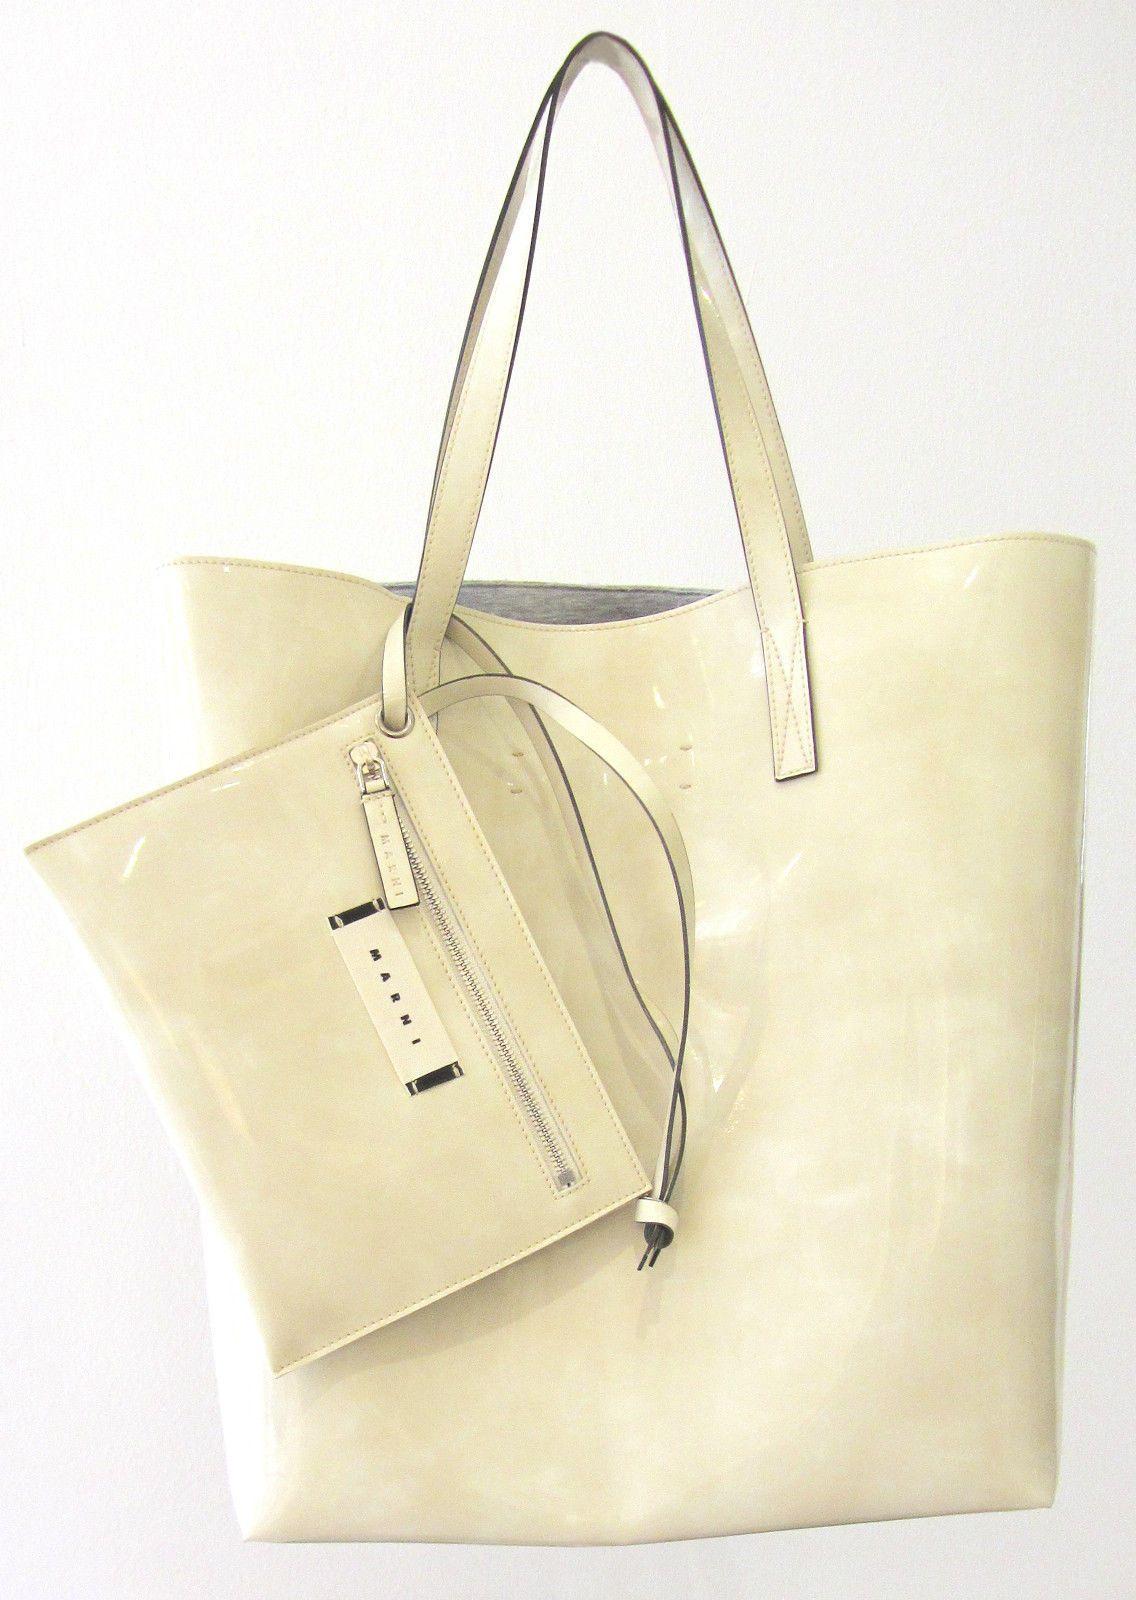 marni shopping bag ralph lauren shopping bag reusable shopping bags canada